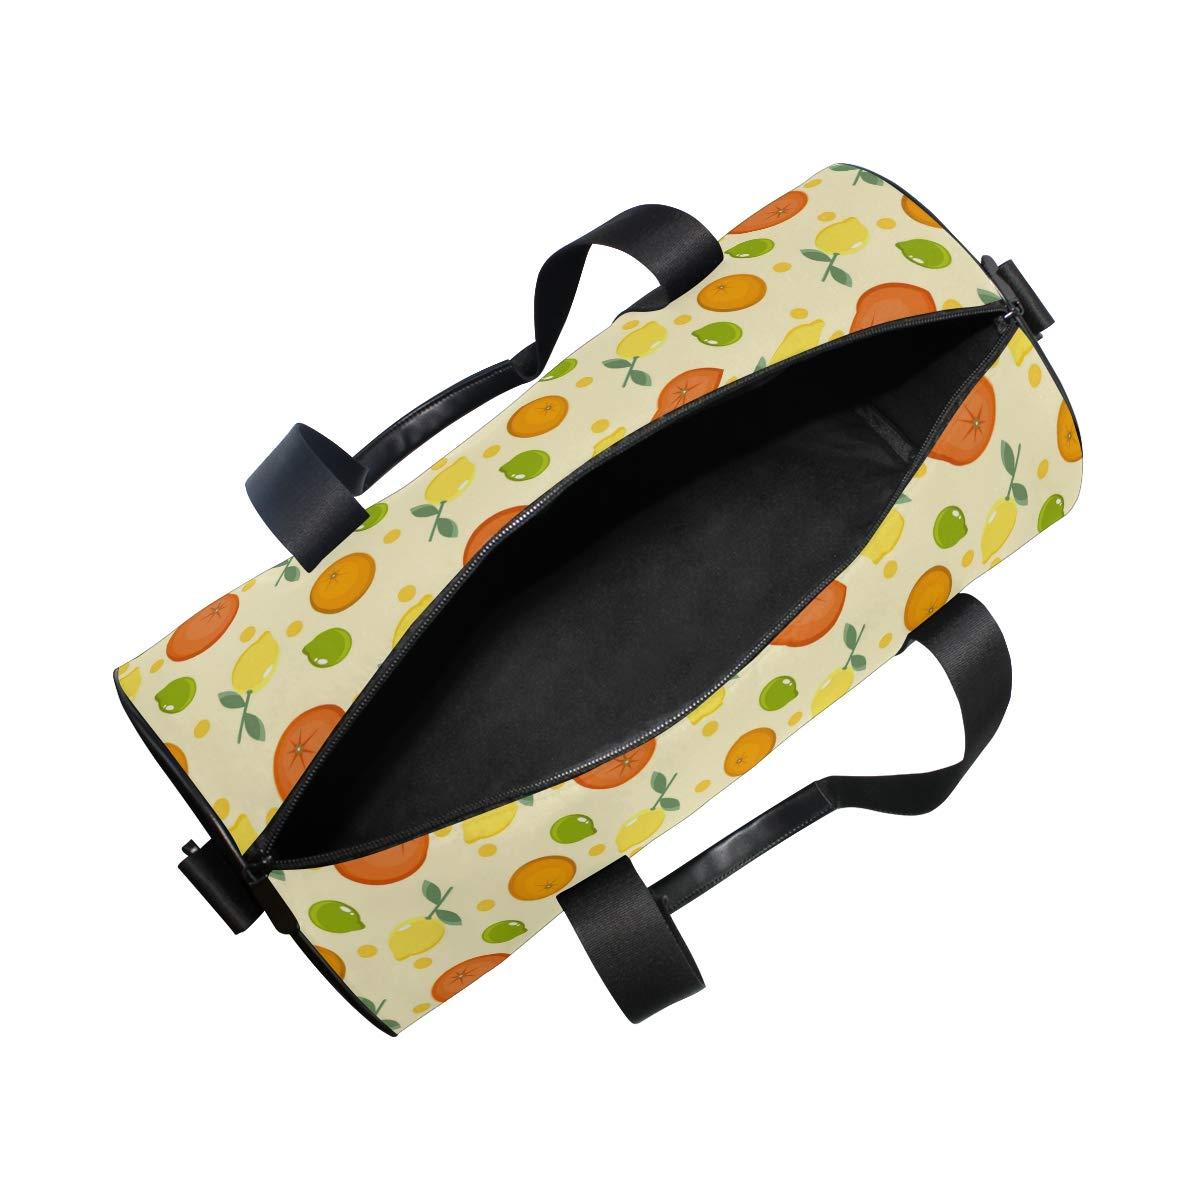 Waterproof Non-Slip Wearable Crossbody Bag fitness bag Shoulder Bag Fruit Snack Pictures